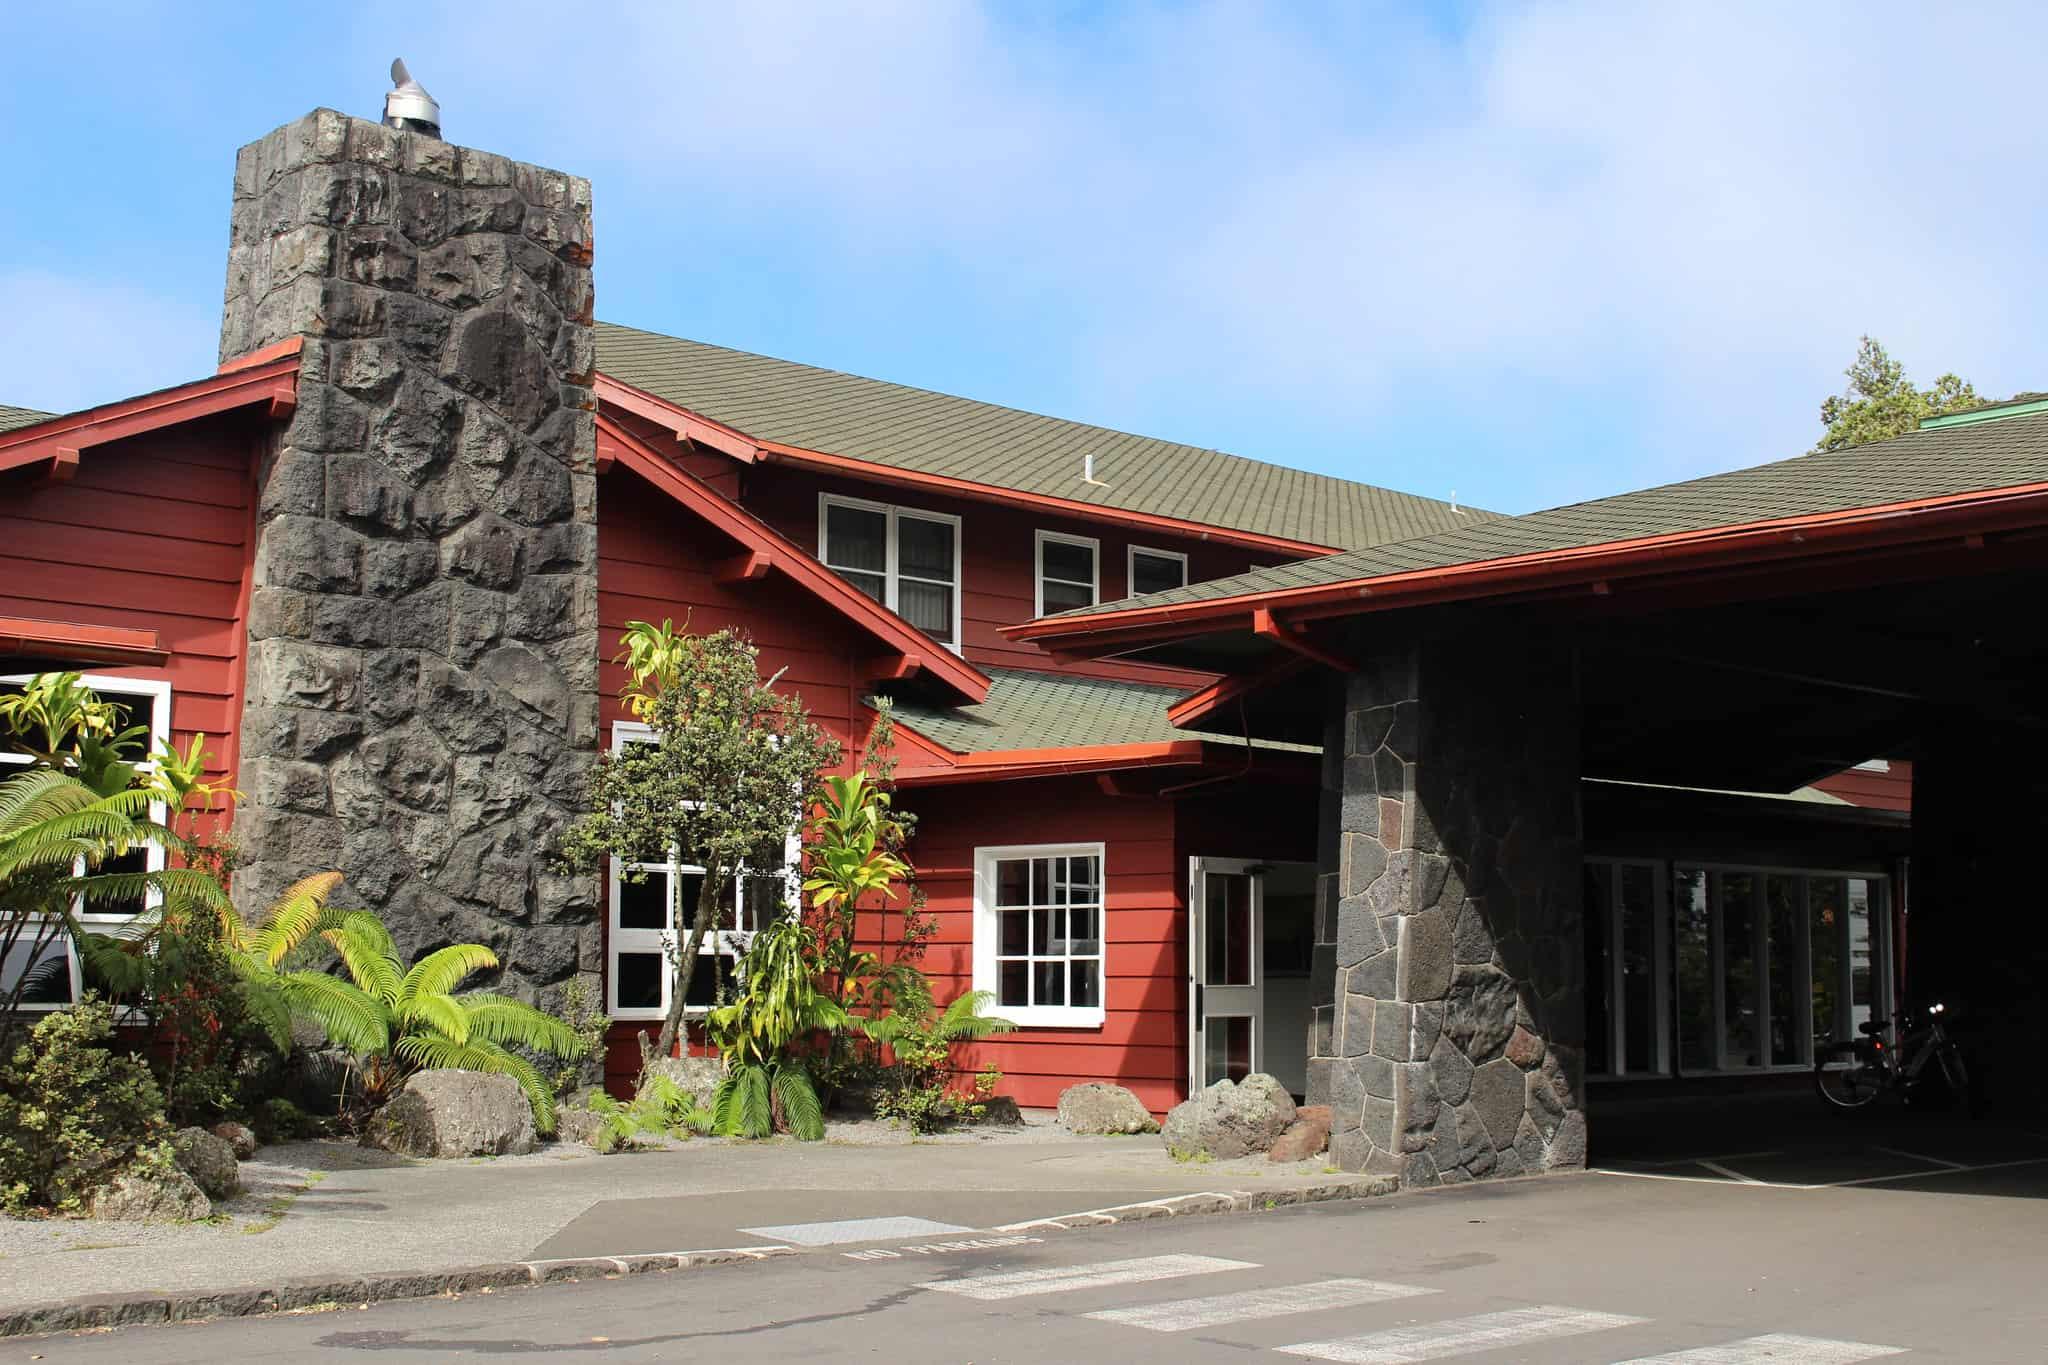 Hawaii Volcanoes - Volcano House - Amy Meredith via Flickr